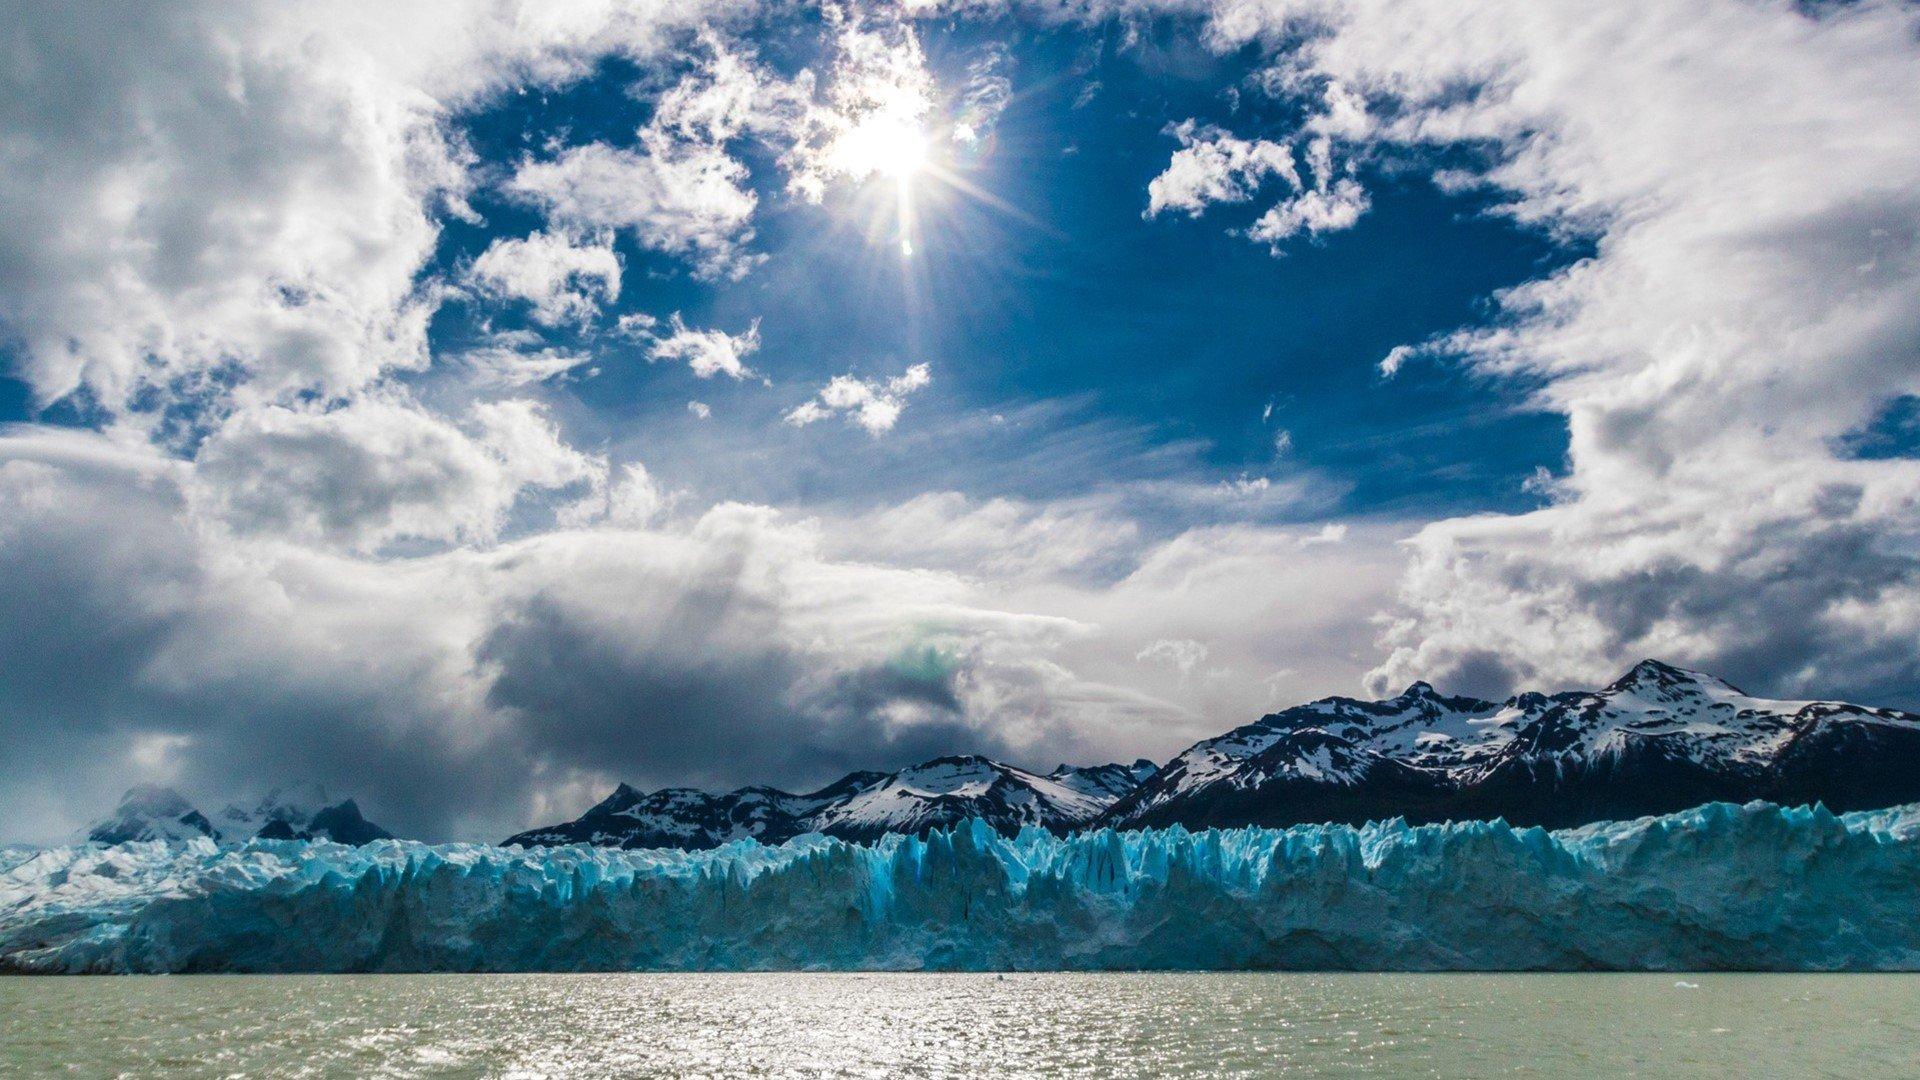 Free Glacier High Quality Background Id 151598 For Hd 1080p Desktop